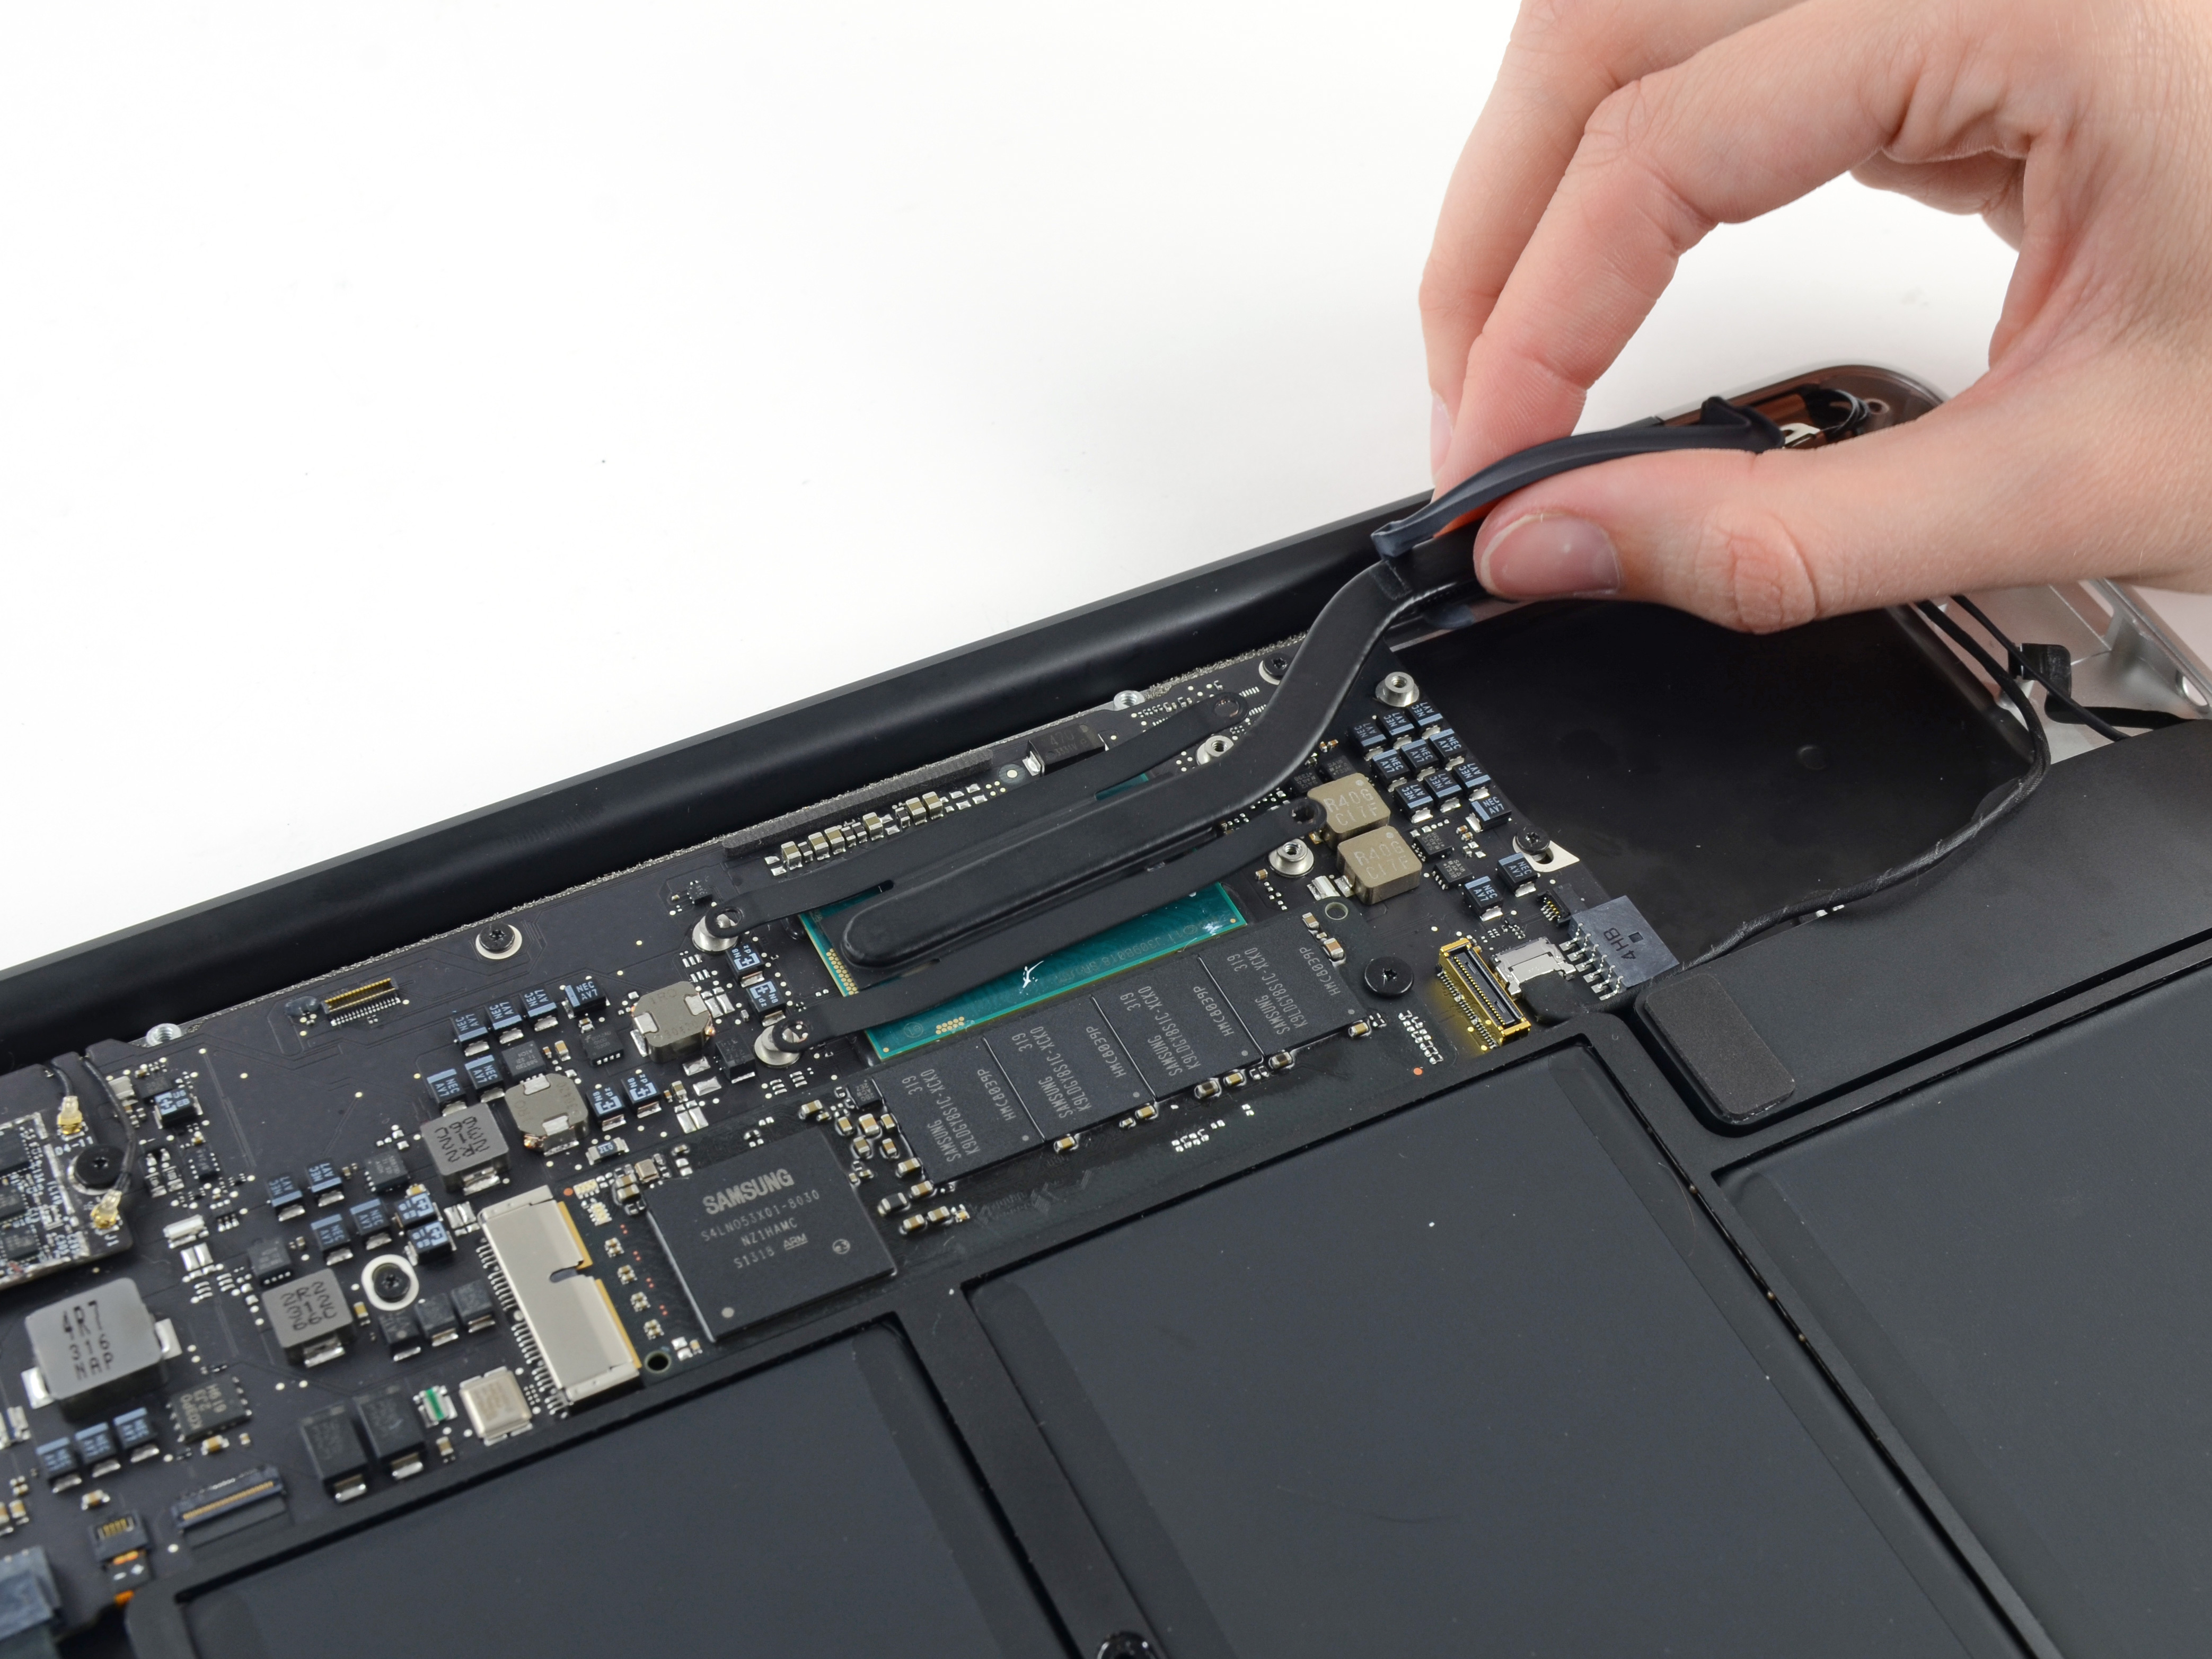 macbook air 2012 service manual open source user manual u2022 rh dramatic varieties com Mid-2011-2012 MacBook Pro 13.3 Specs 2017 MacBook Pro Mid